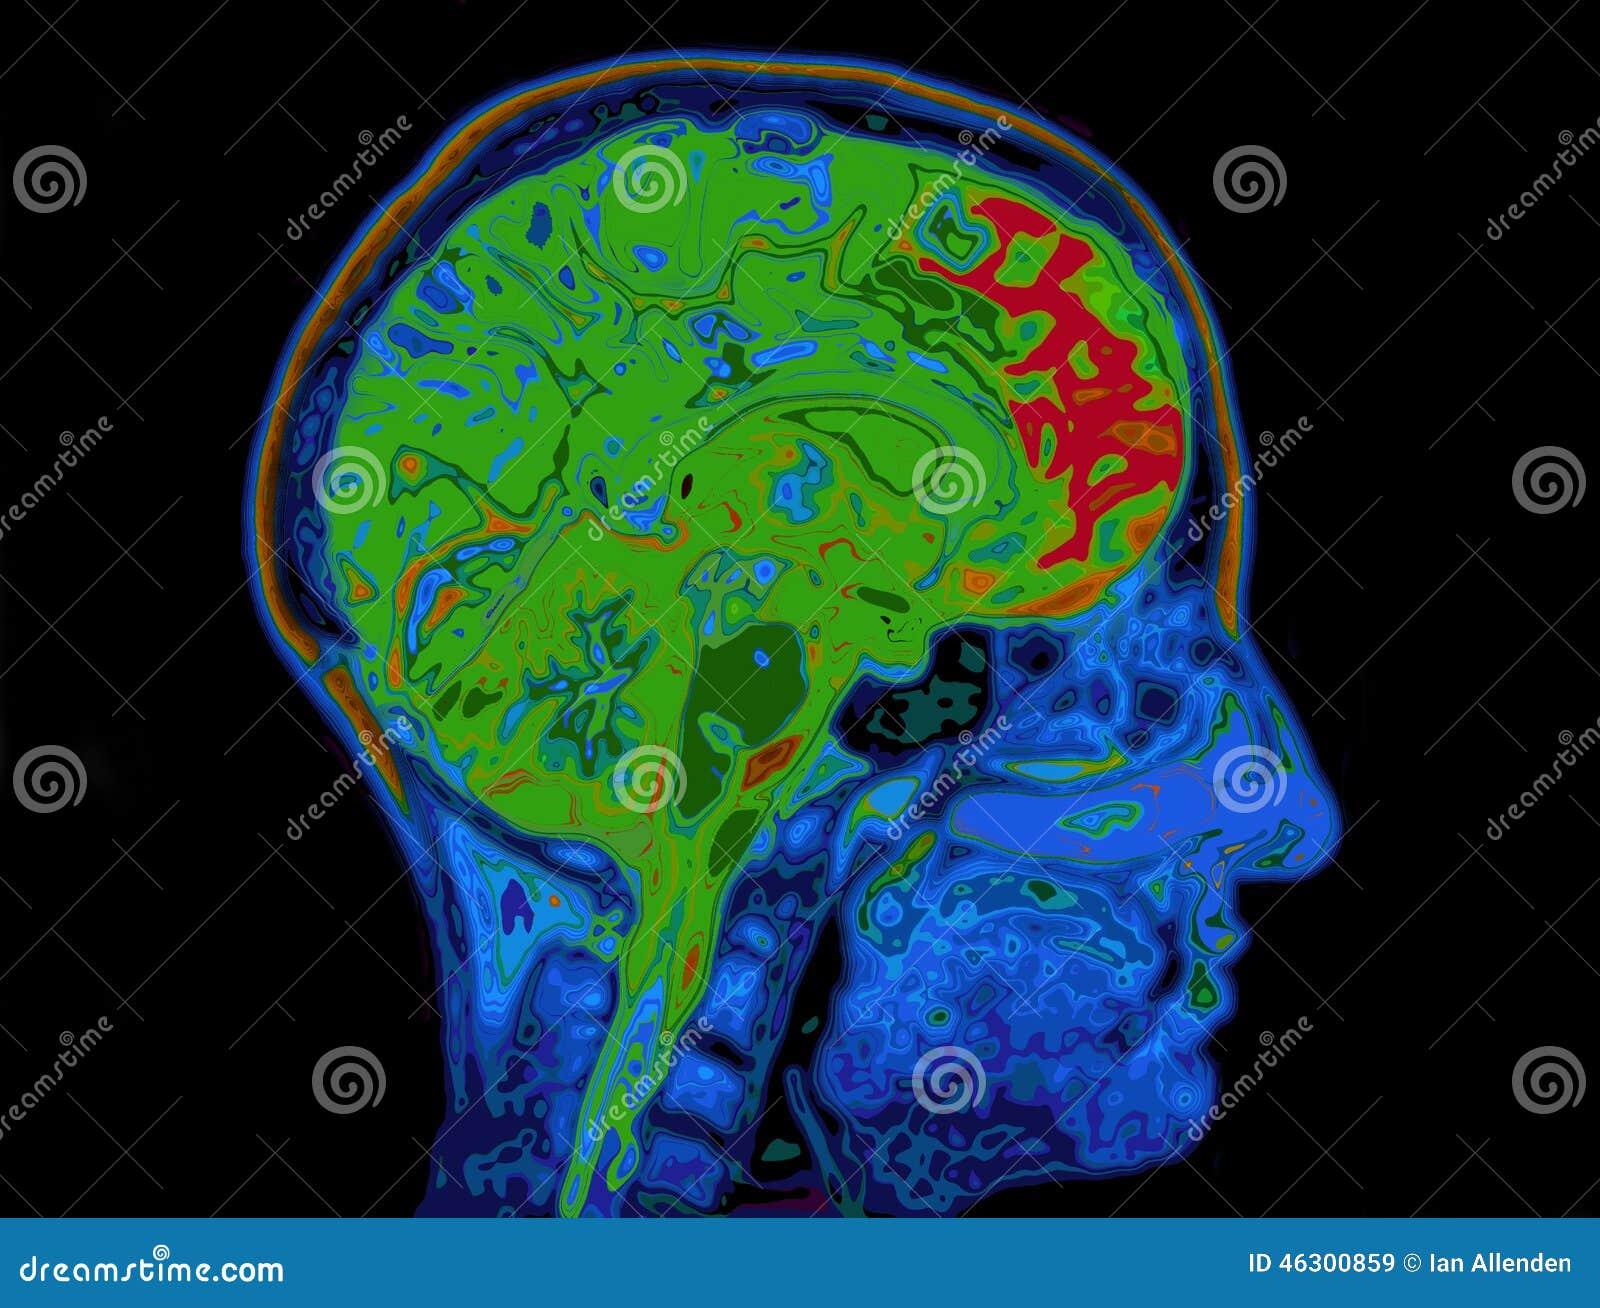 MRI Image Of Head Showing Brain